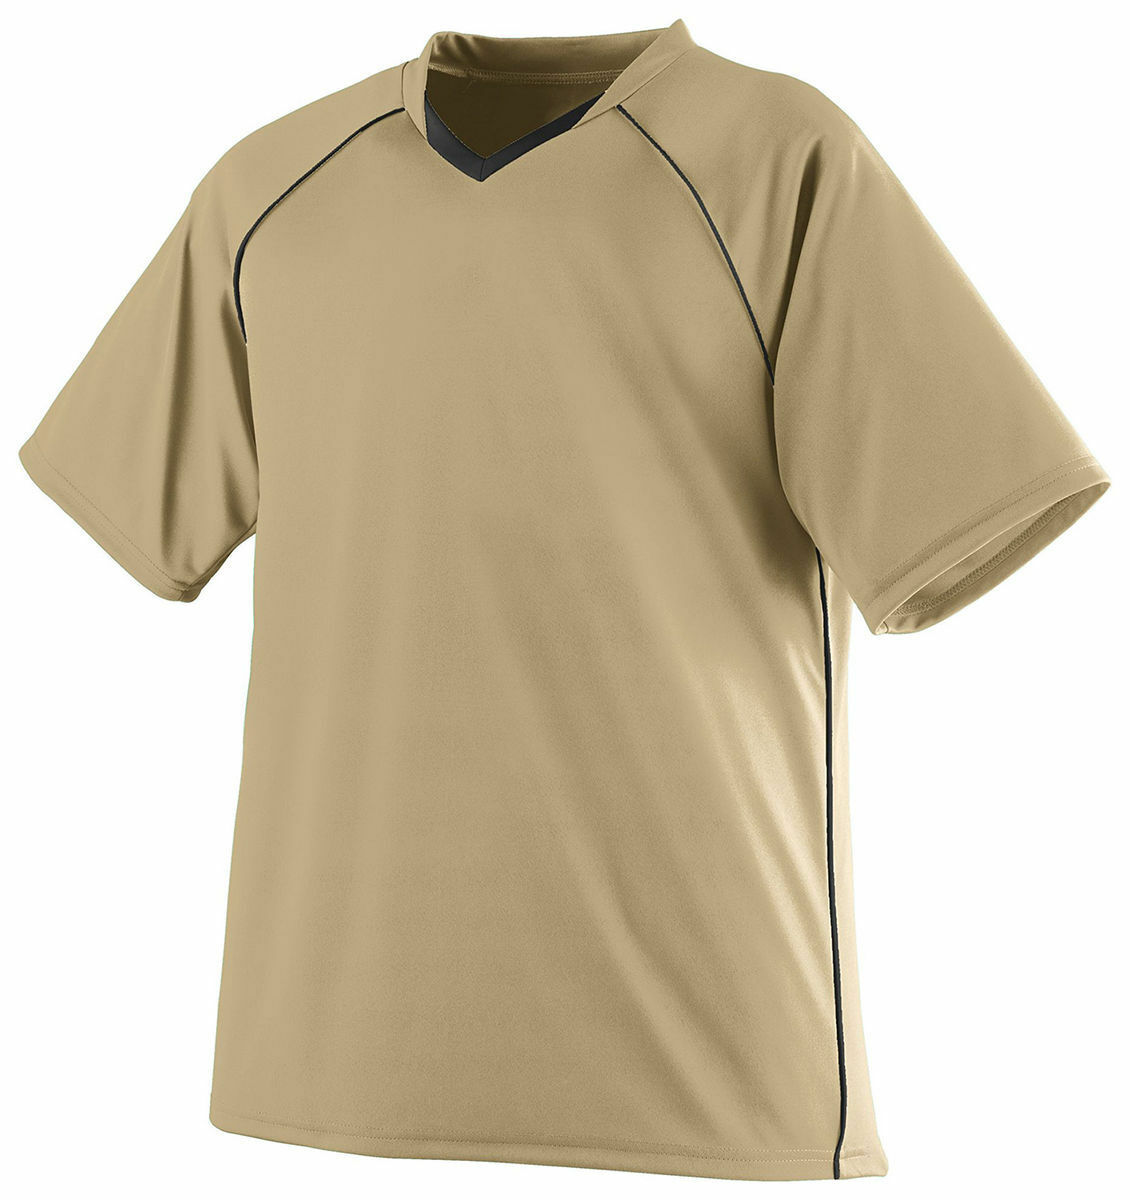 Augusta Sportswear Men's Short Sleeve Tee Polyester Sports Soccer T-Shirt. 214